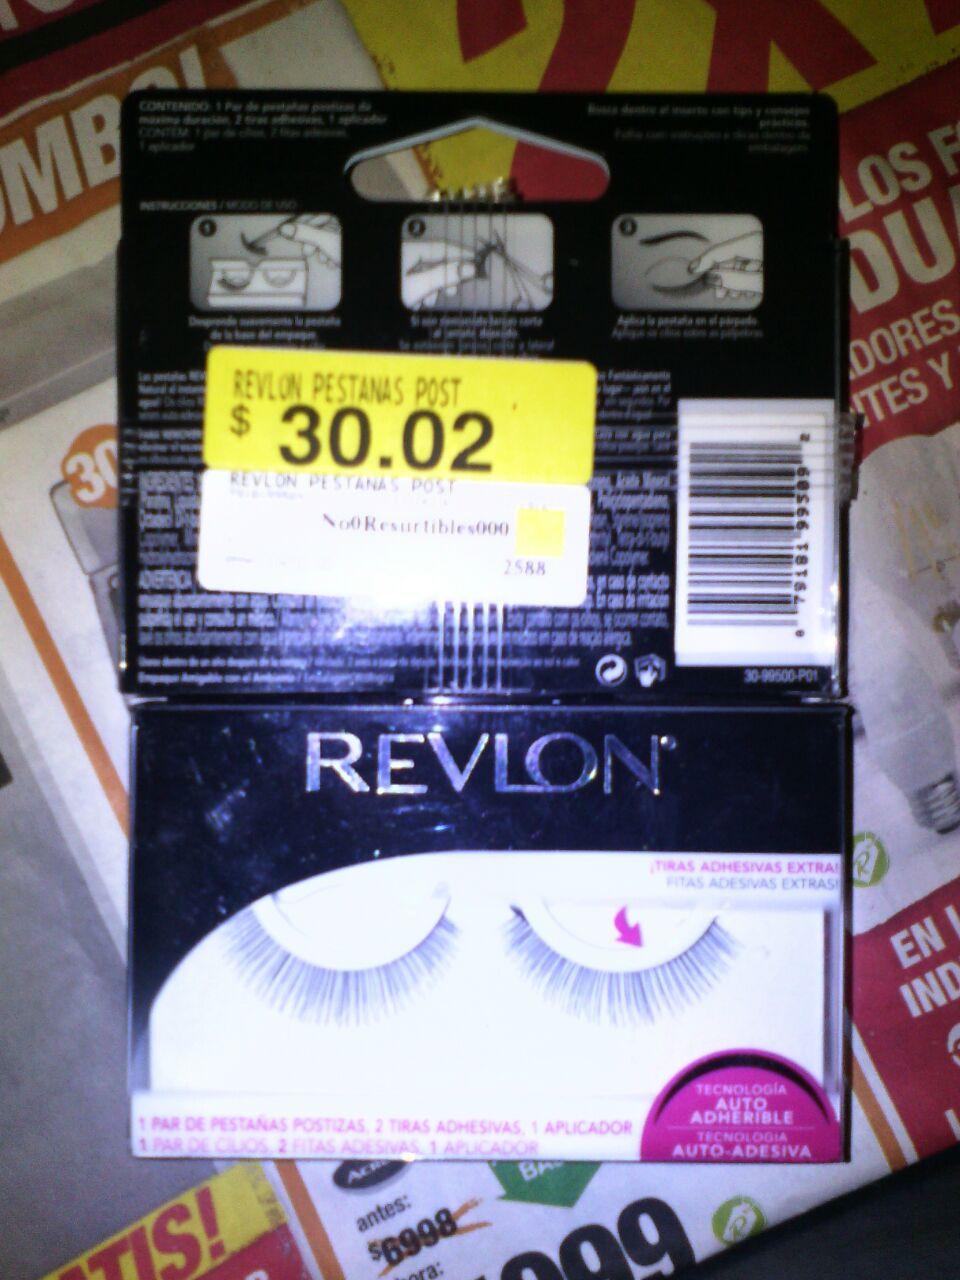 Walmart Universidad Villahermosa: Pestañas postizas Revlon a $30.02